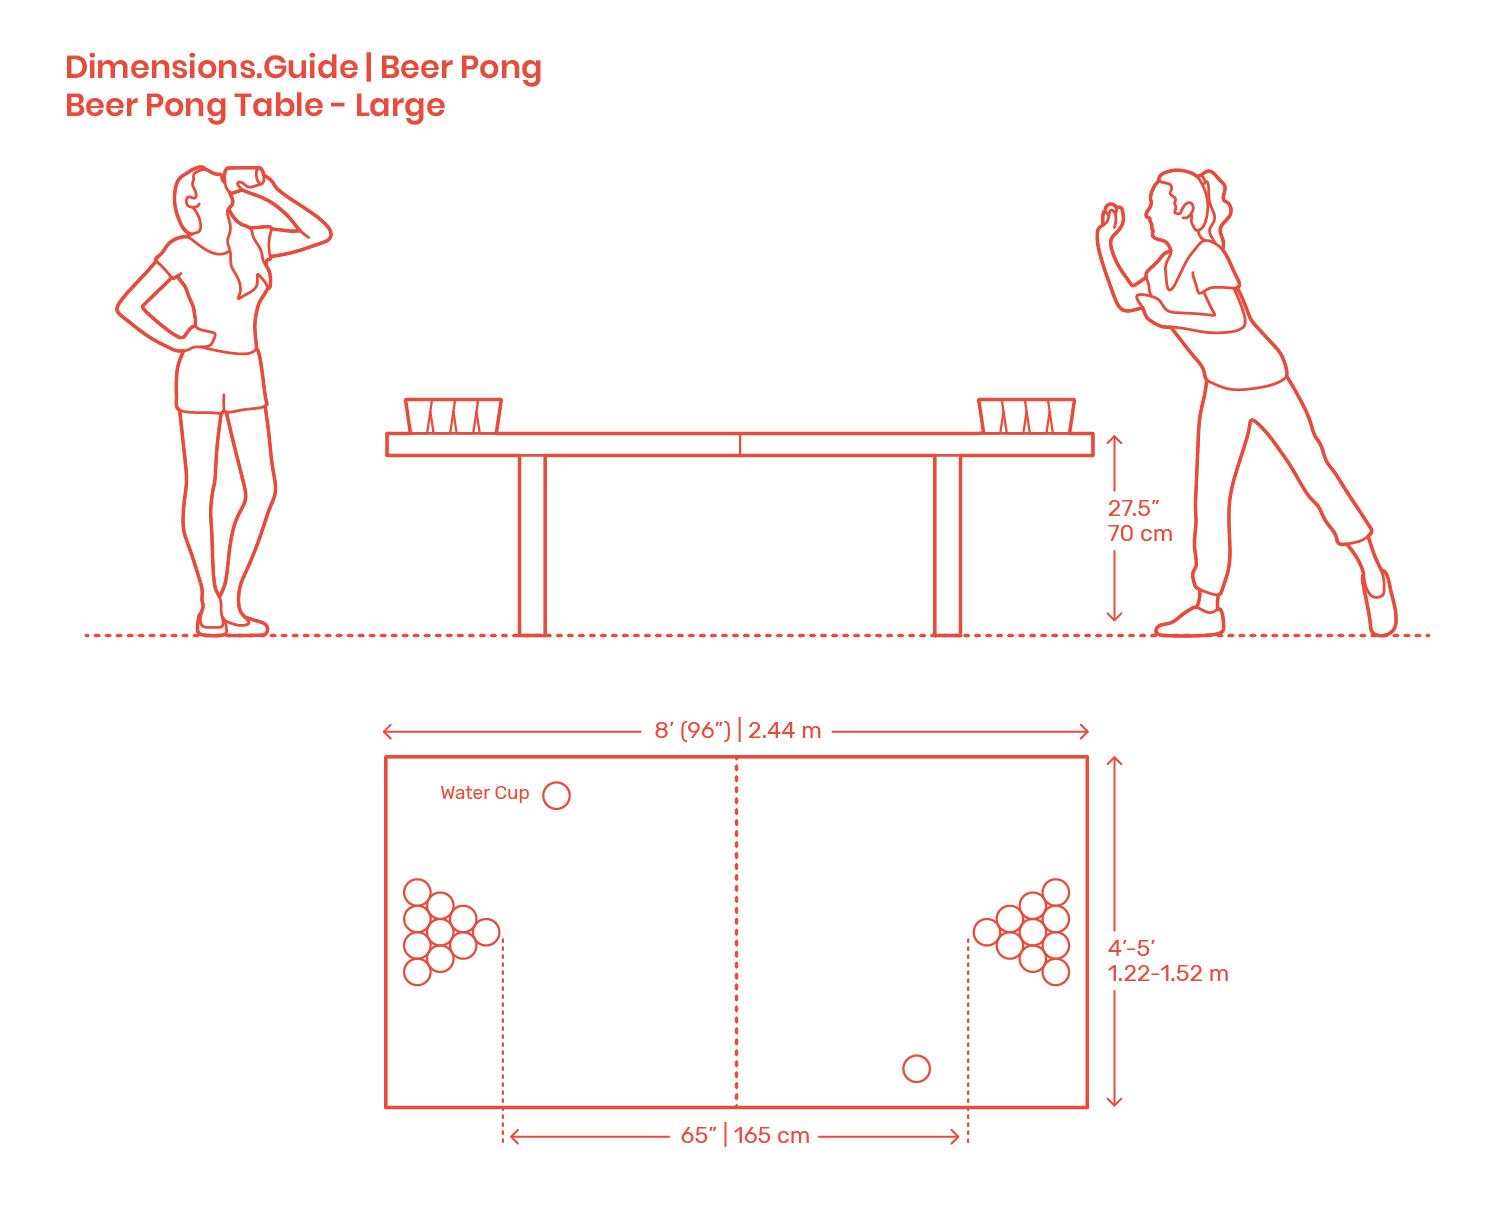 Regulation Beer Pong Table Length   Decorations I Can Make